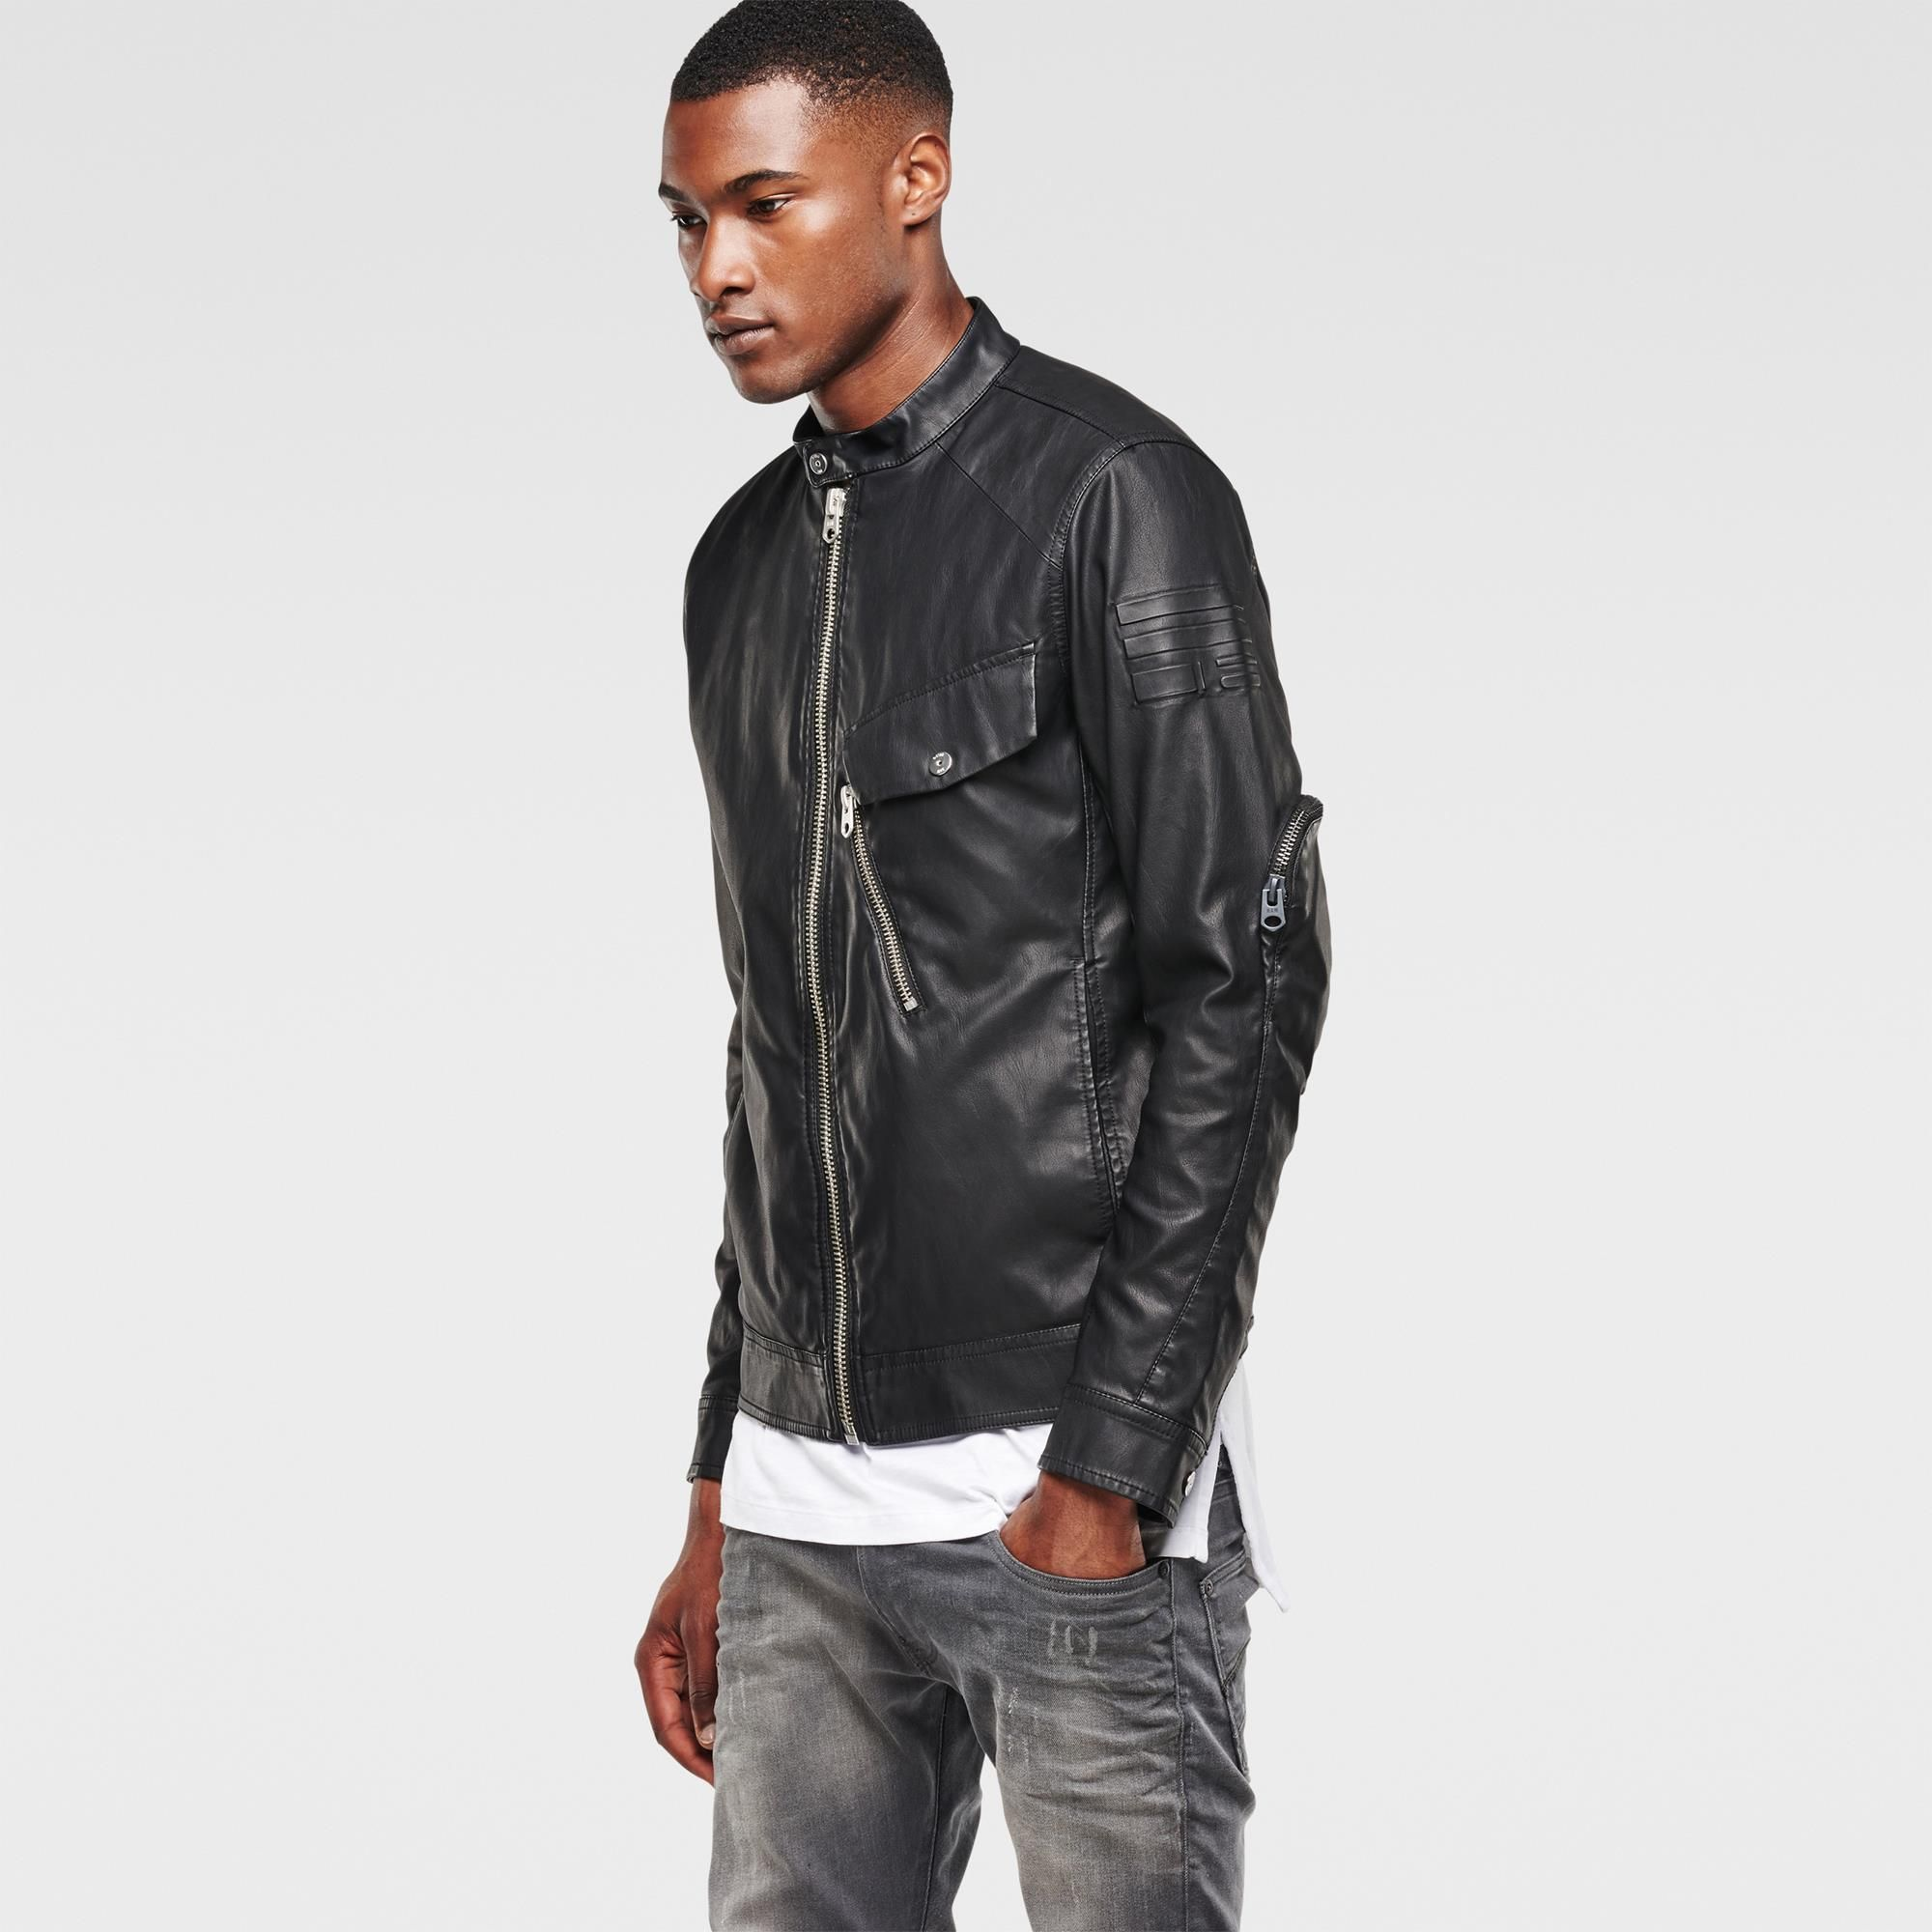 Revend 3d Slim Faux Leather Jacket Black G Star Raw Black Faux Leather Jacket Faux Leather Jackets Leather Jacket [ 2000 x 2000 Pixel ]